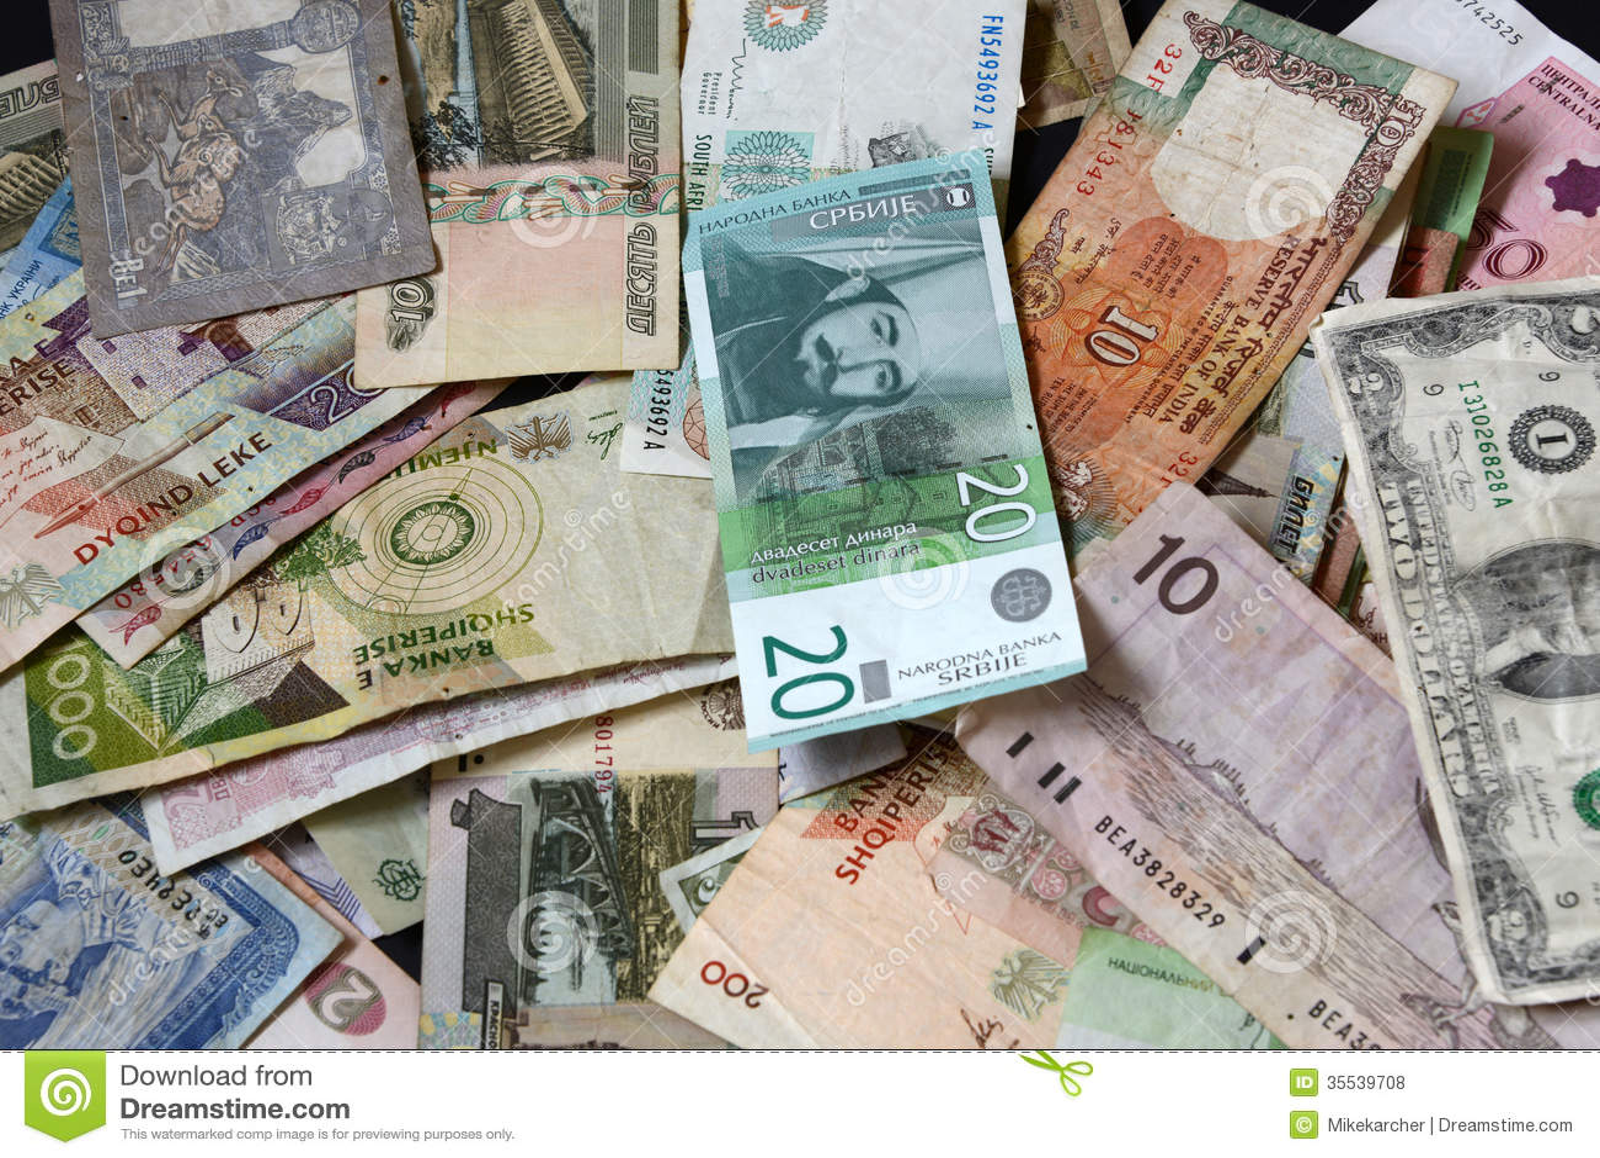 Banknotes Royalty Free Stock Photos - Image: 35539708